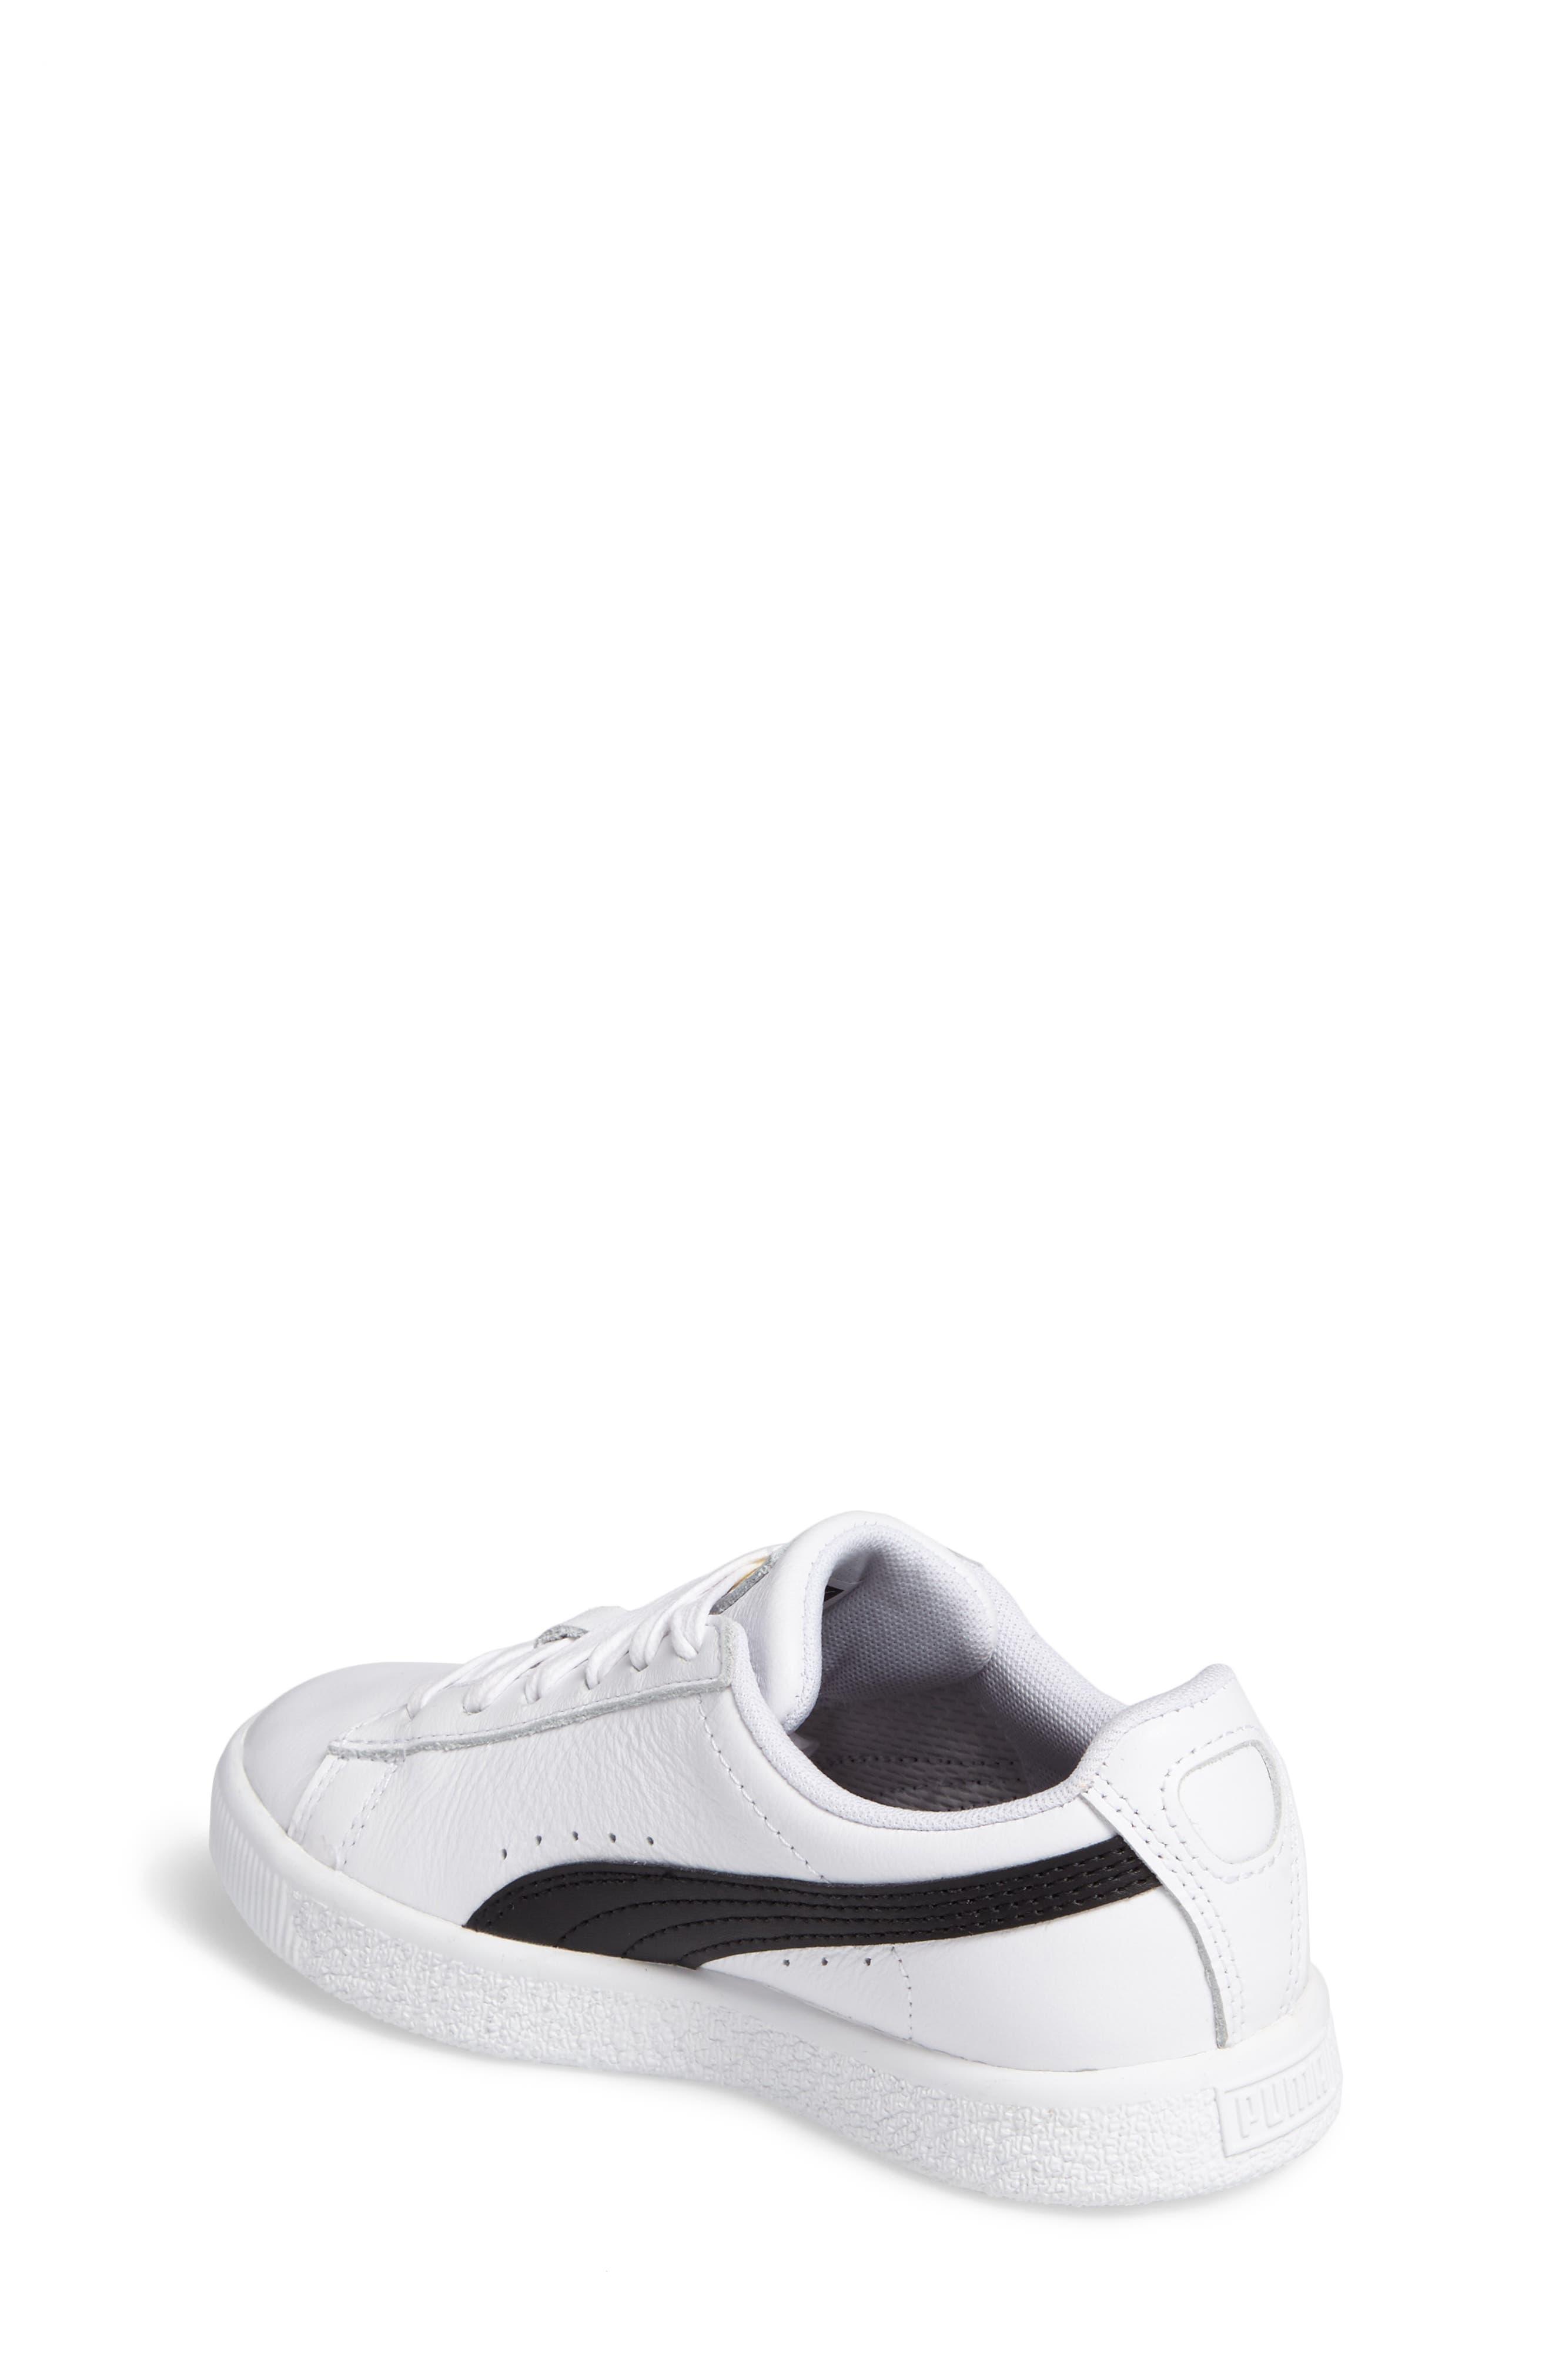 Alternate Image 2  - PUMA Clyde Core Foil Sneaker (Toddler, Little Kid & Big Kid)